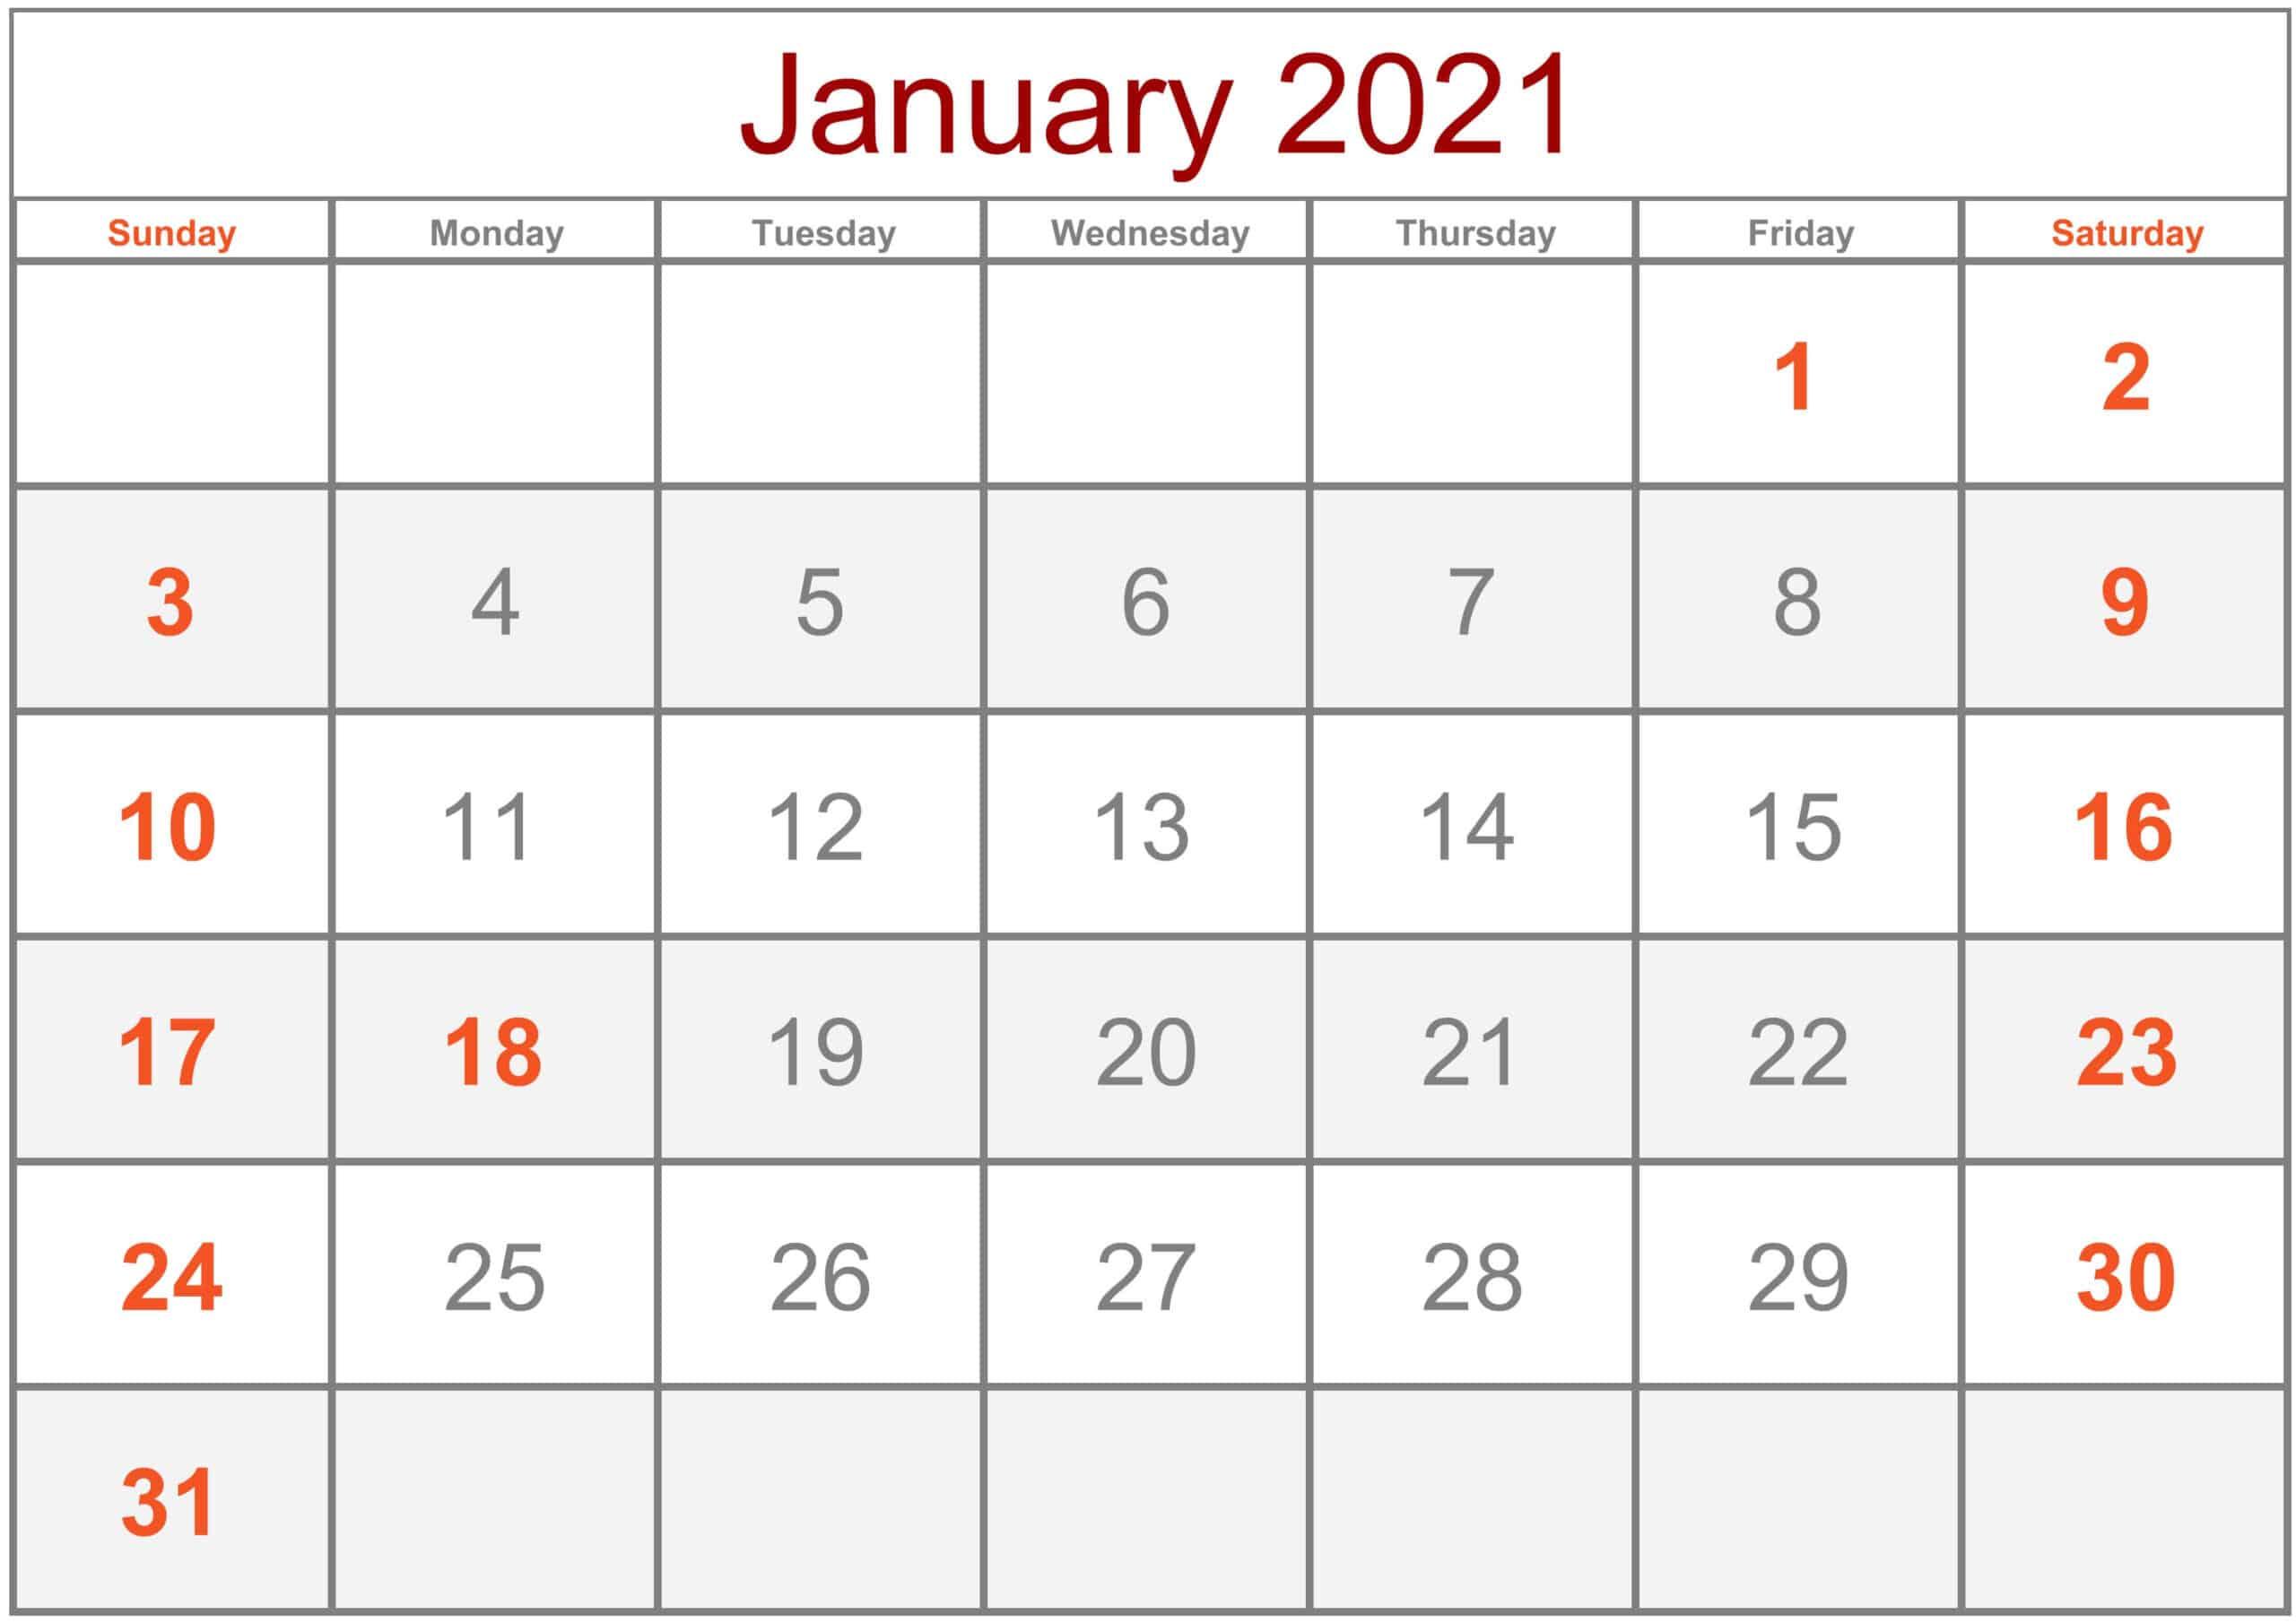 Calendar January 2021 Excel